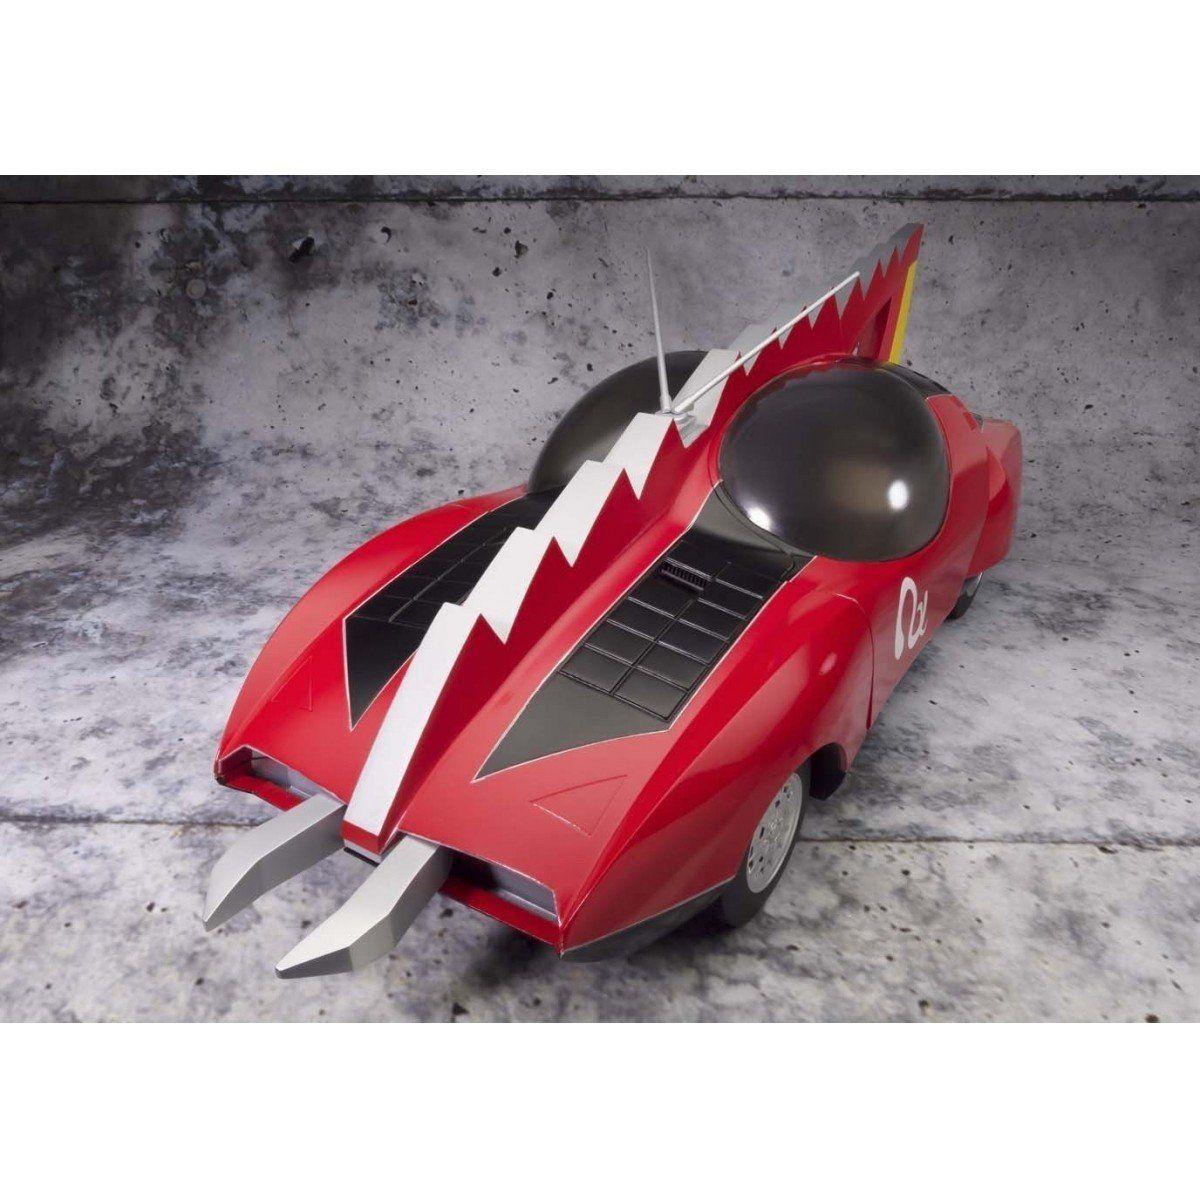 Kamen Rider Ridoron S.H.Figuarts - Bandai - CD